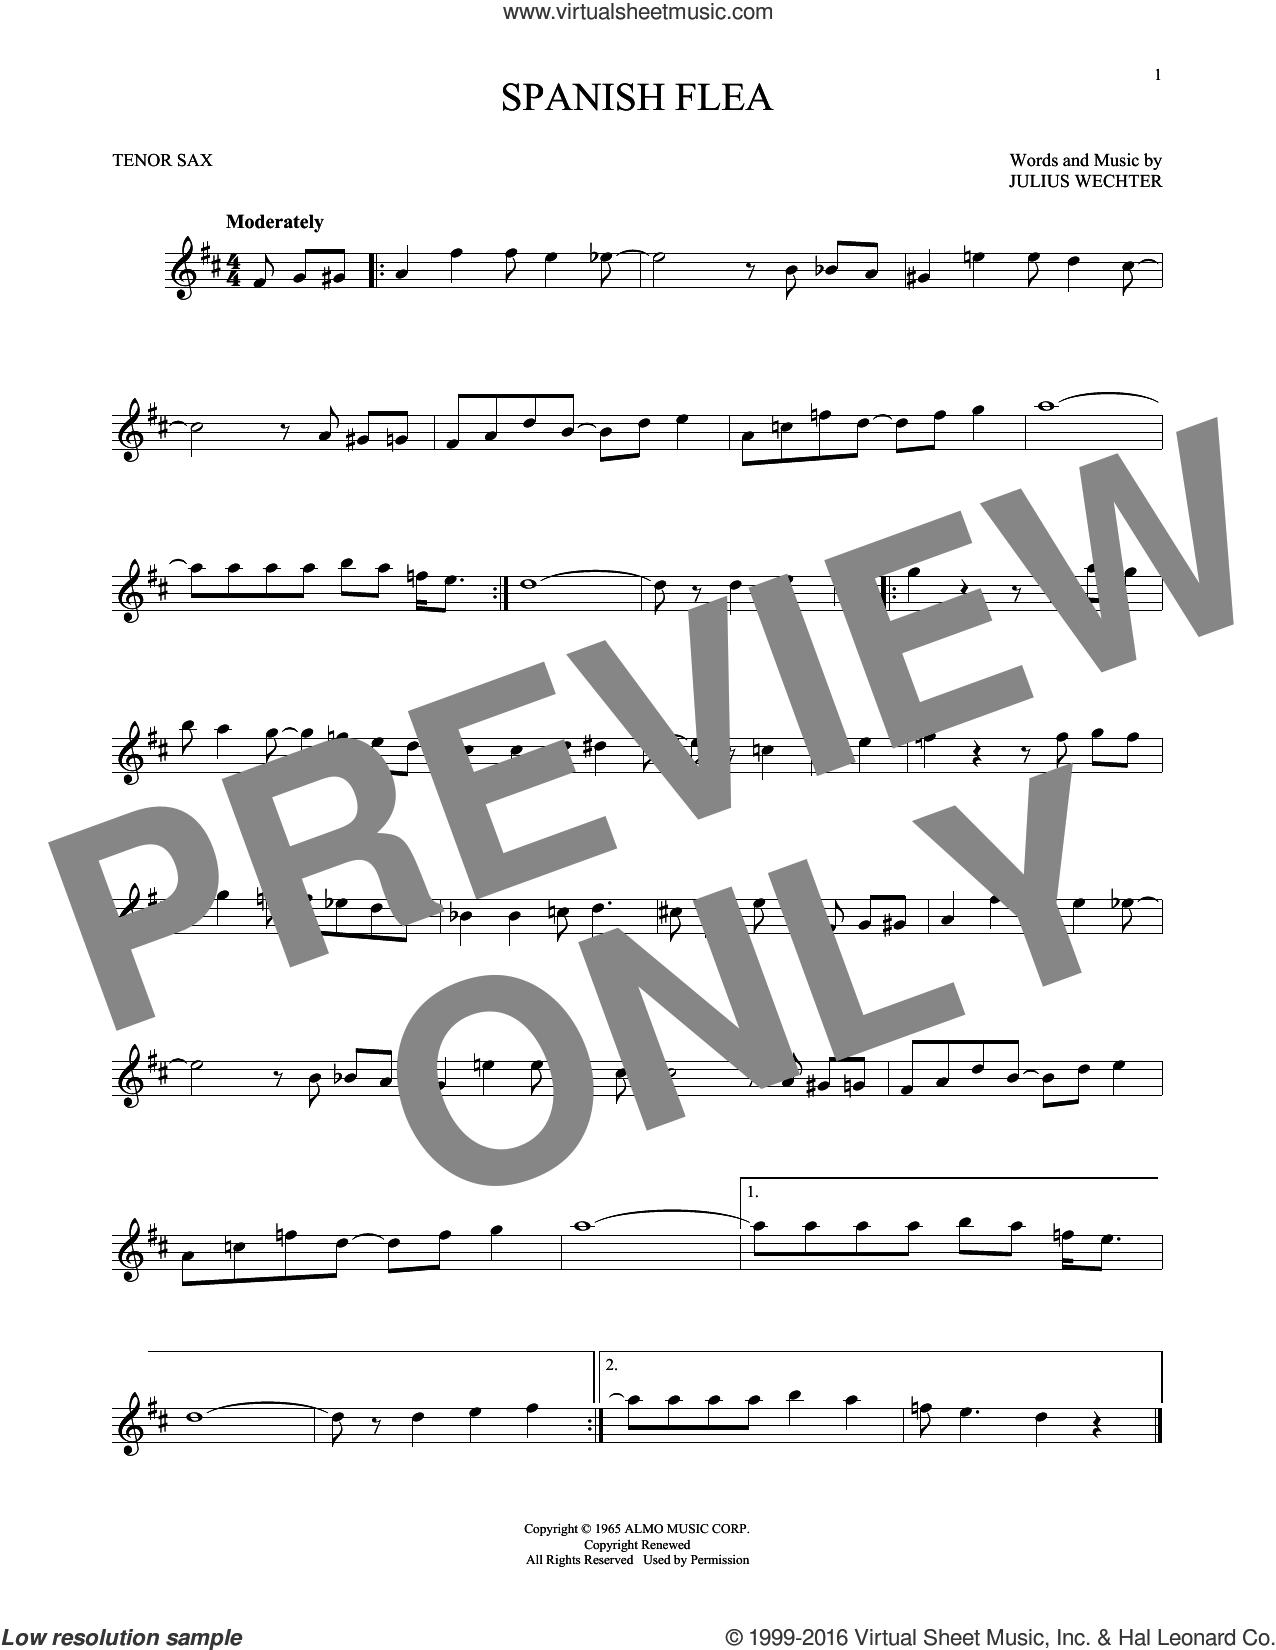 Spanish Flea sheet music for tenor saxophone solo by Herb Alpert & The Tijuana Brass and Julius Wechter, intermediate skill level